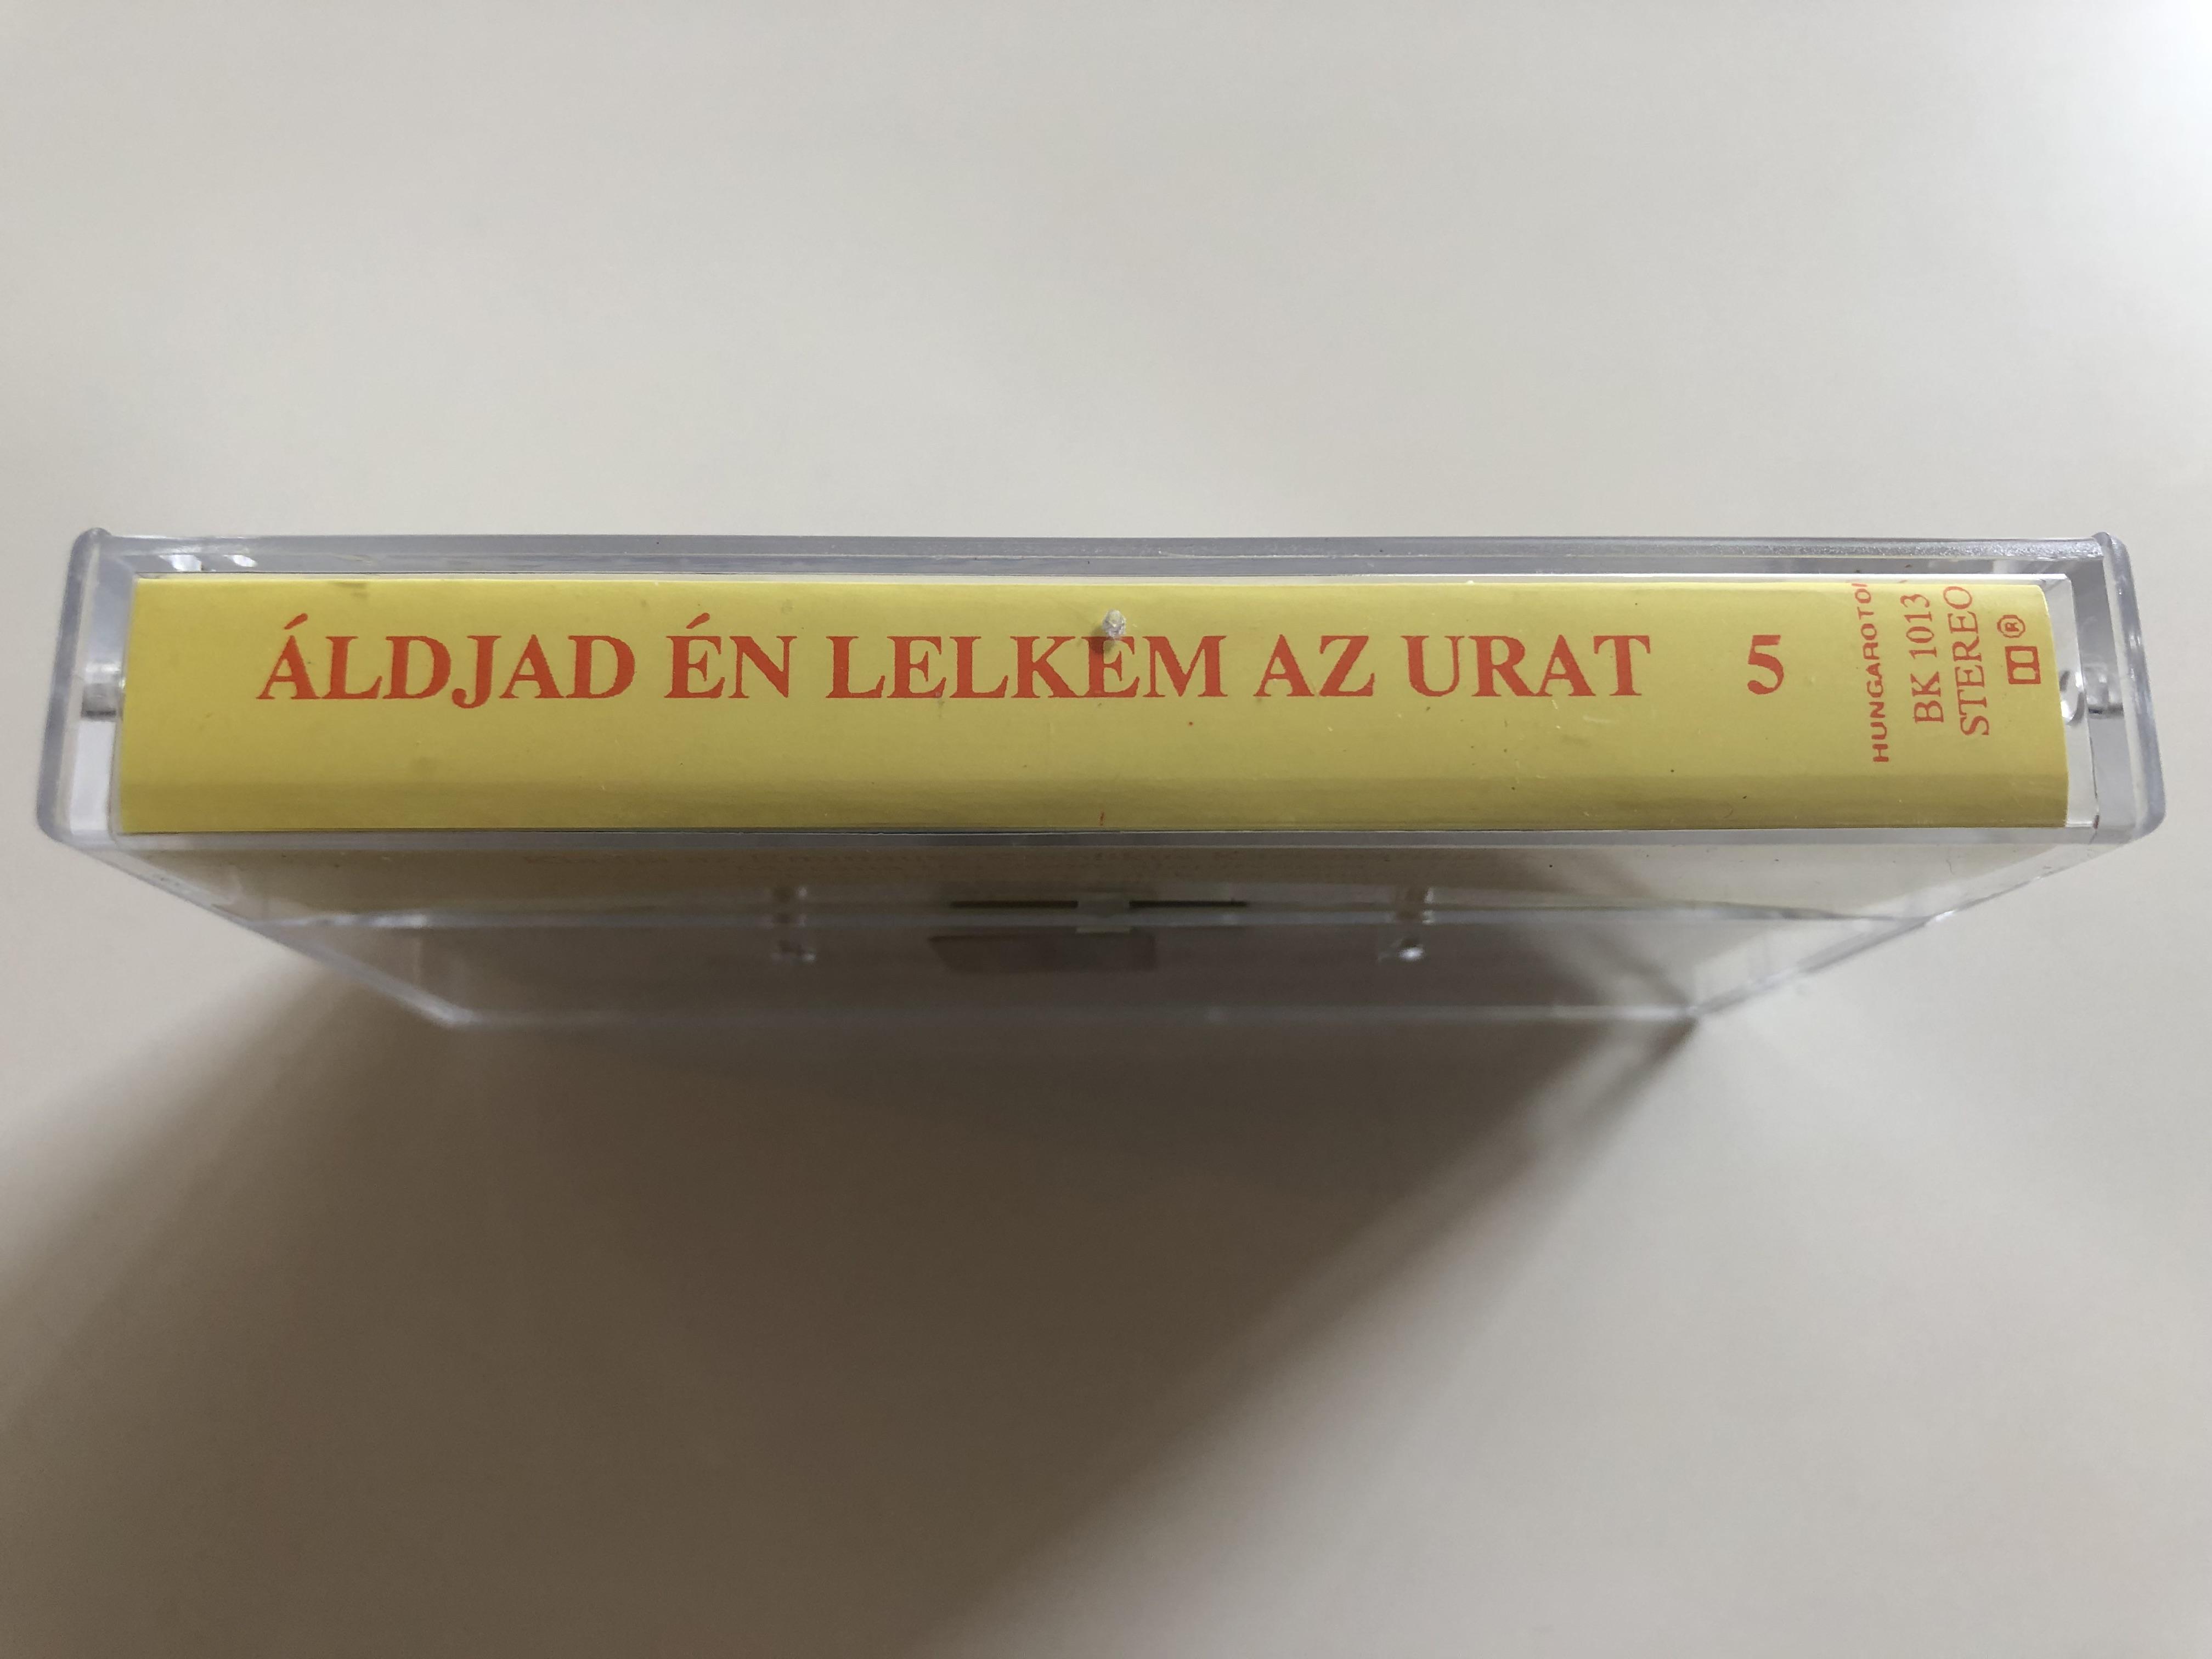 -ldjad-n-lelkem-az-urat-emmausz-katolikus-karizmatikus-k-z-ss-g-nek-s-zenekara-hungaroton-cassette-stereo-bk-1013-4-.jpg